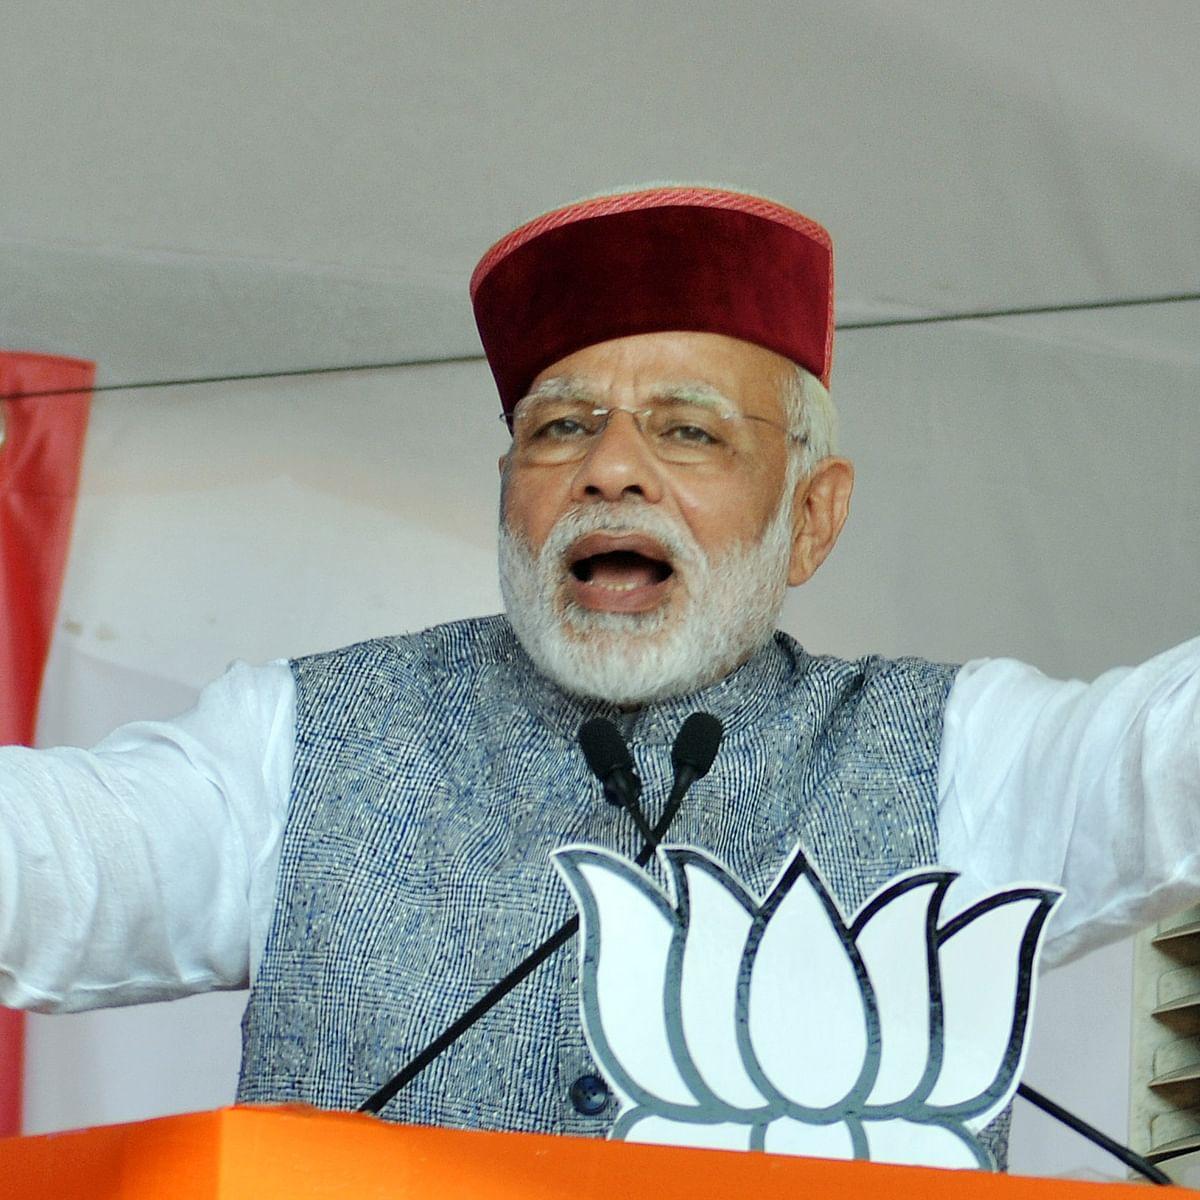 Photo by Shyam Sharma/Hindustan Times via Getty Images